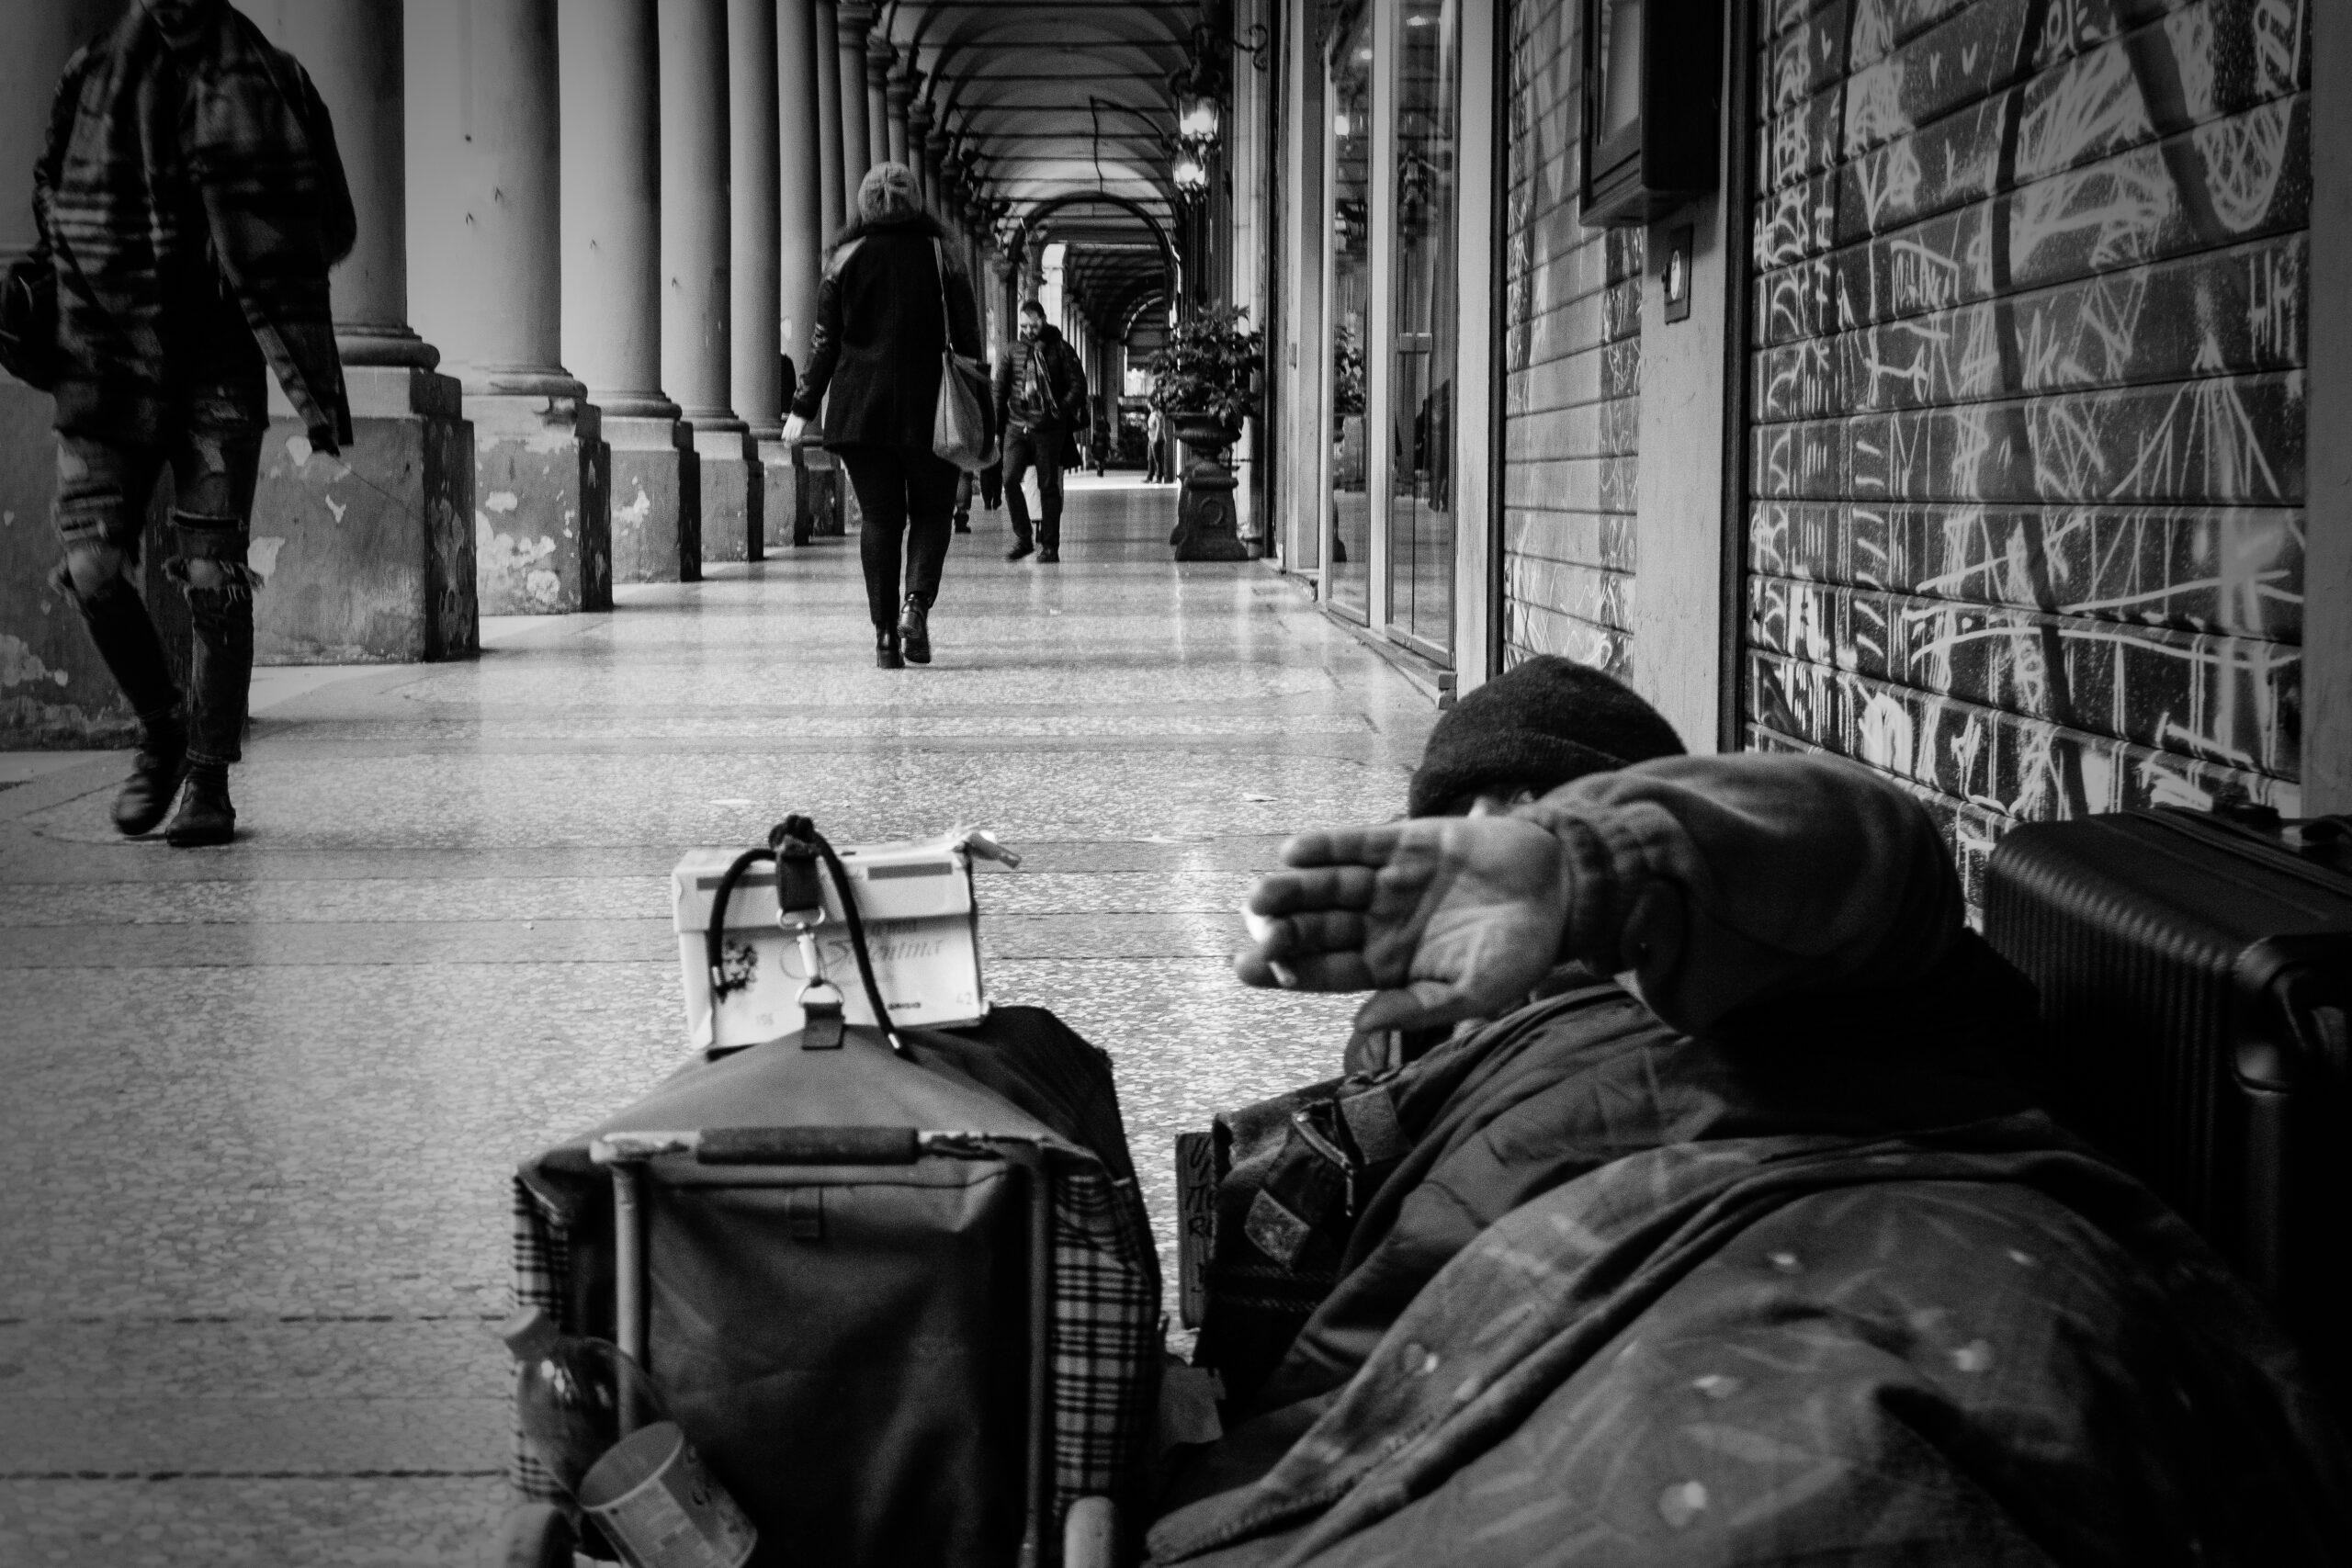 Bologna 13 March 2019, vincenzo Lullo Street Photographer,